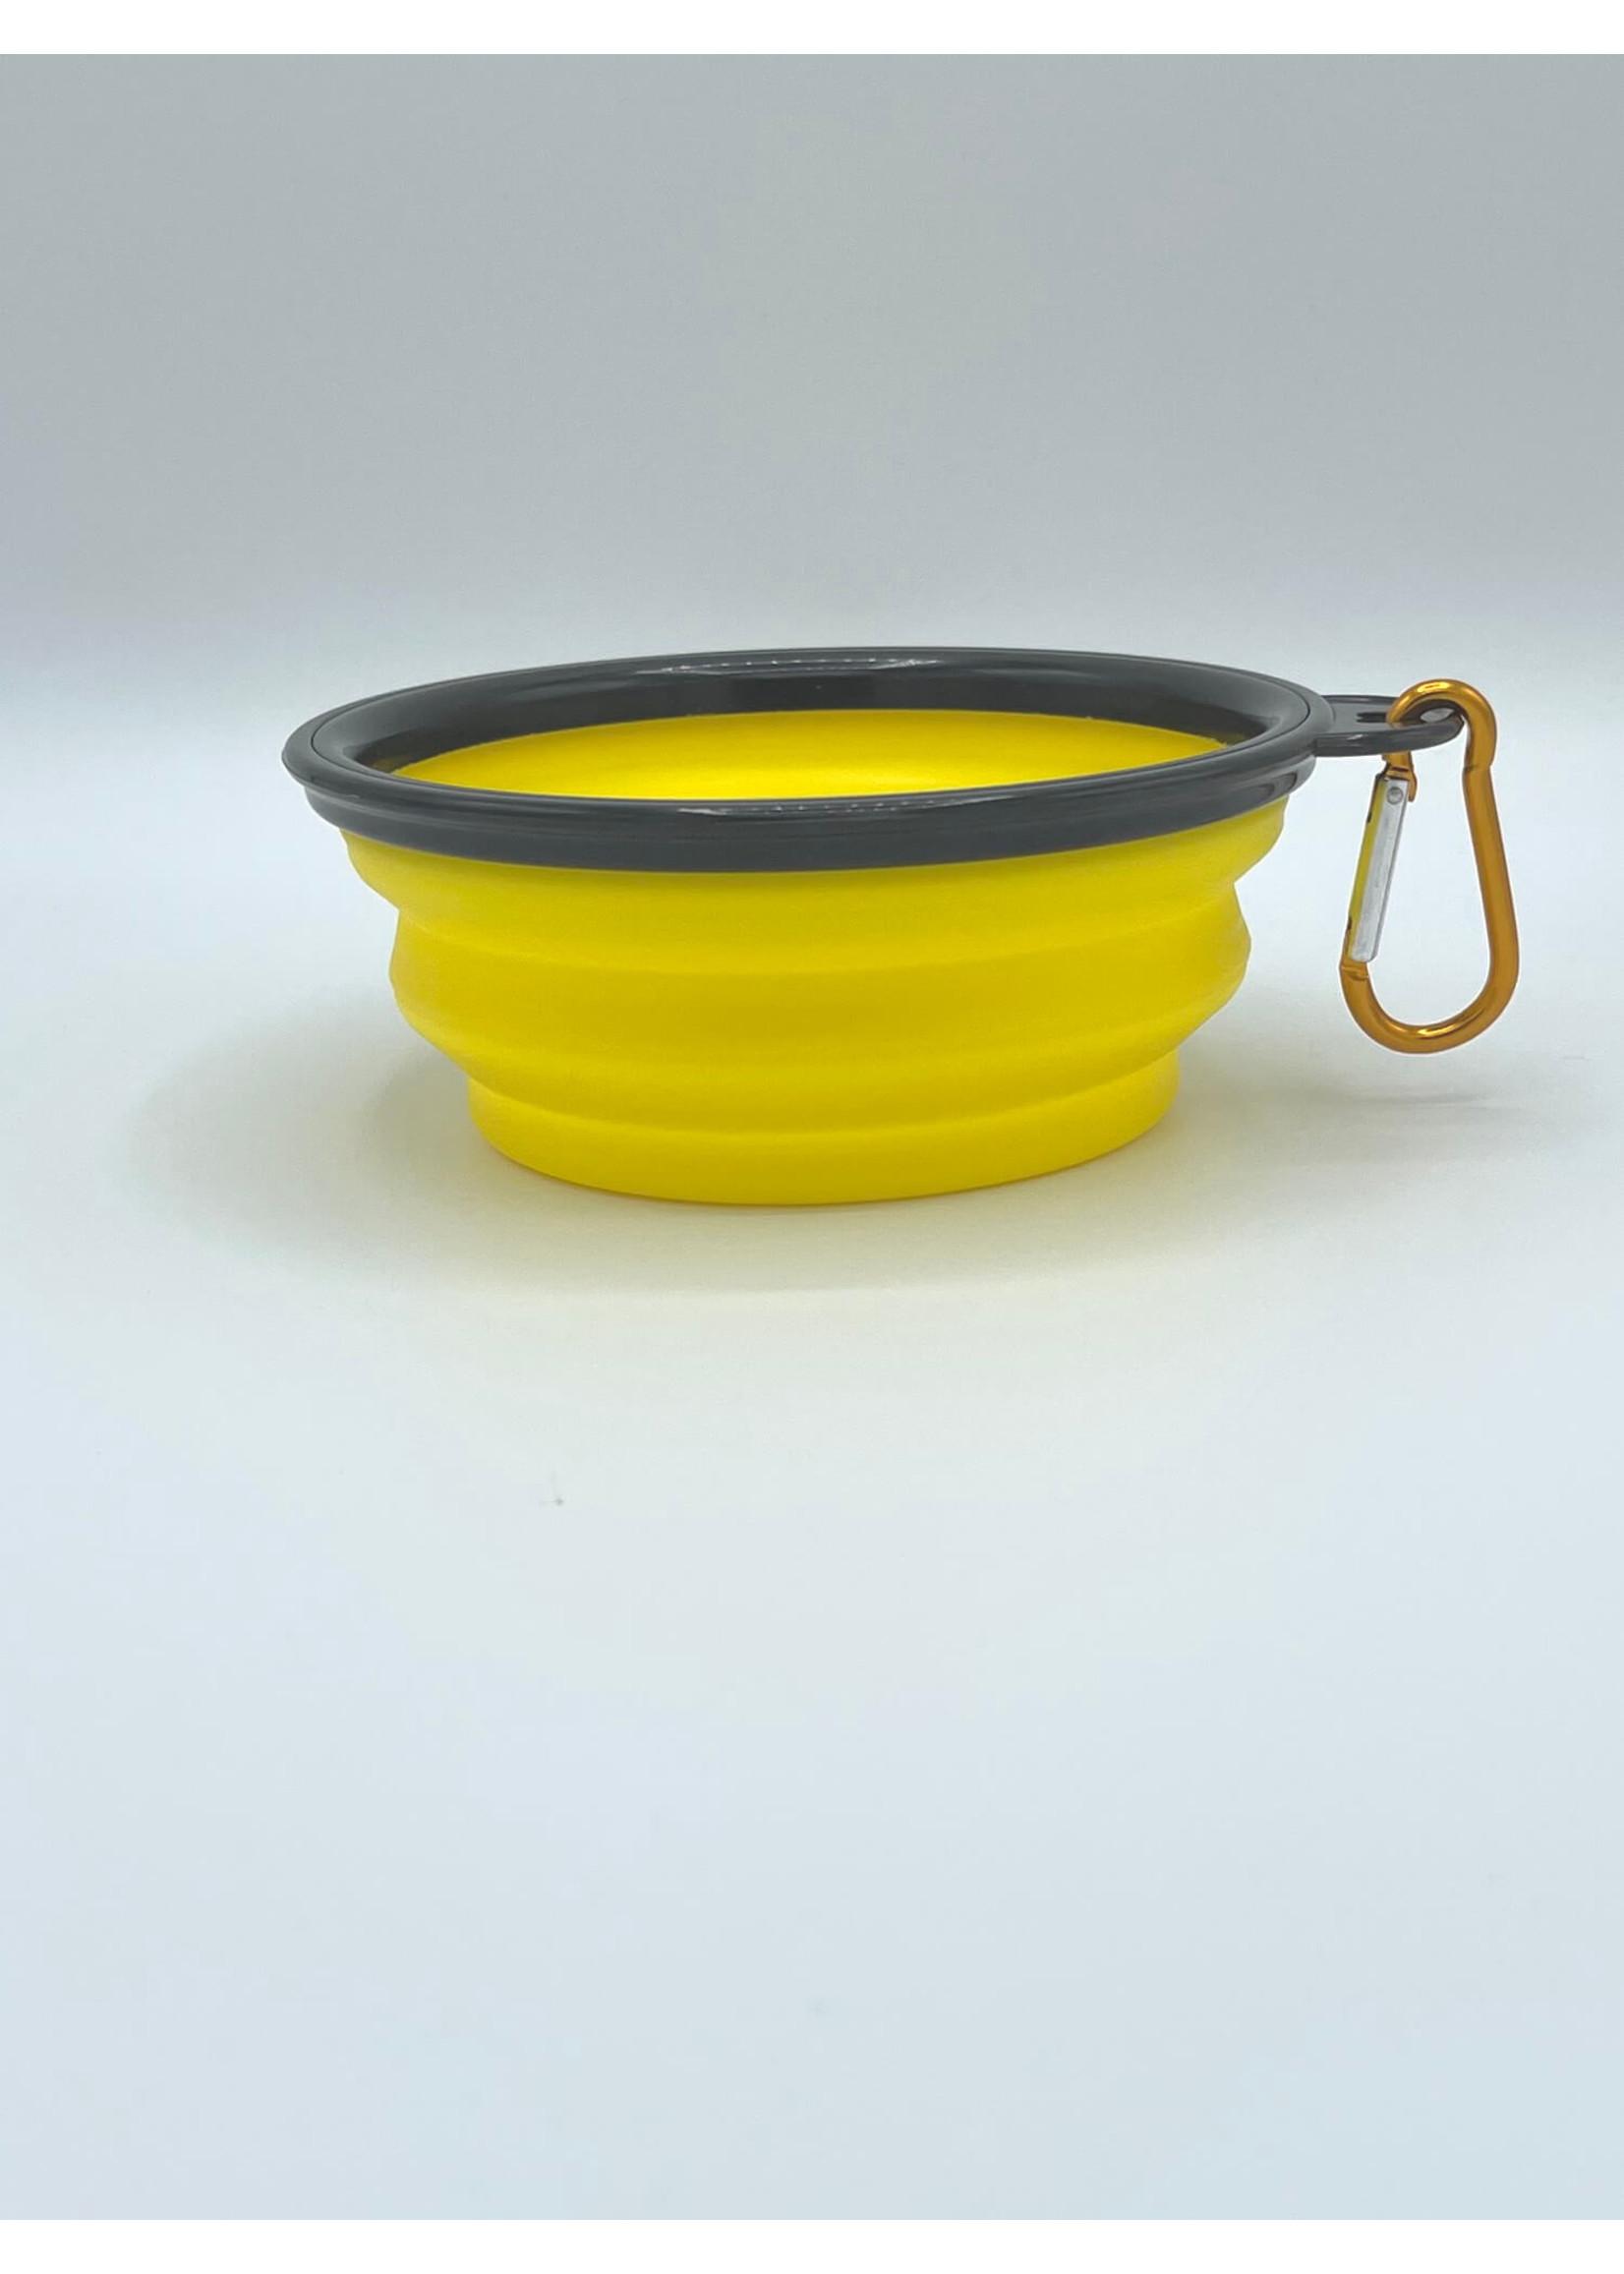 Collapsible Pet Bowl Dish